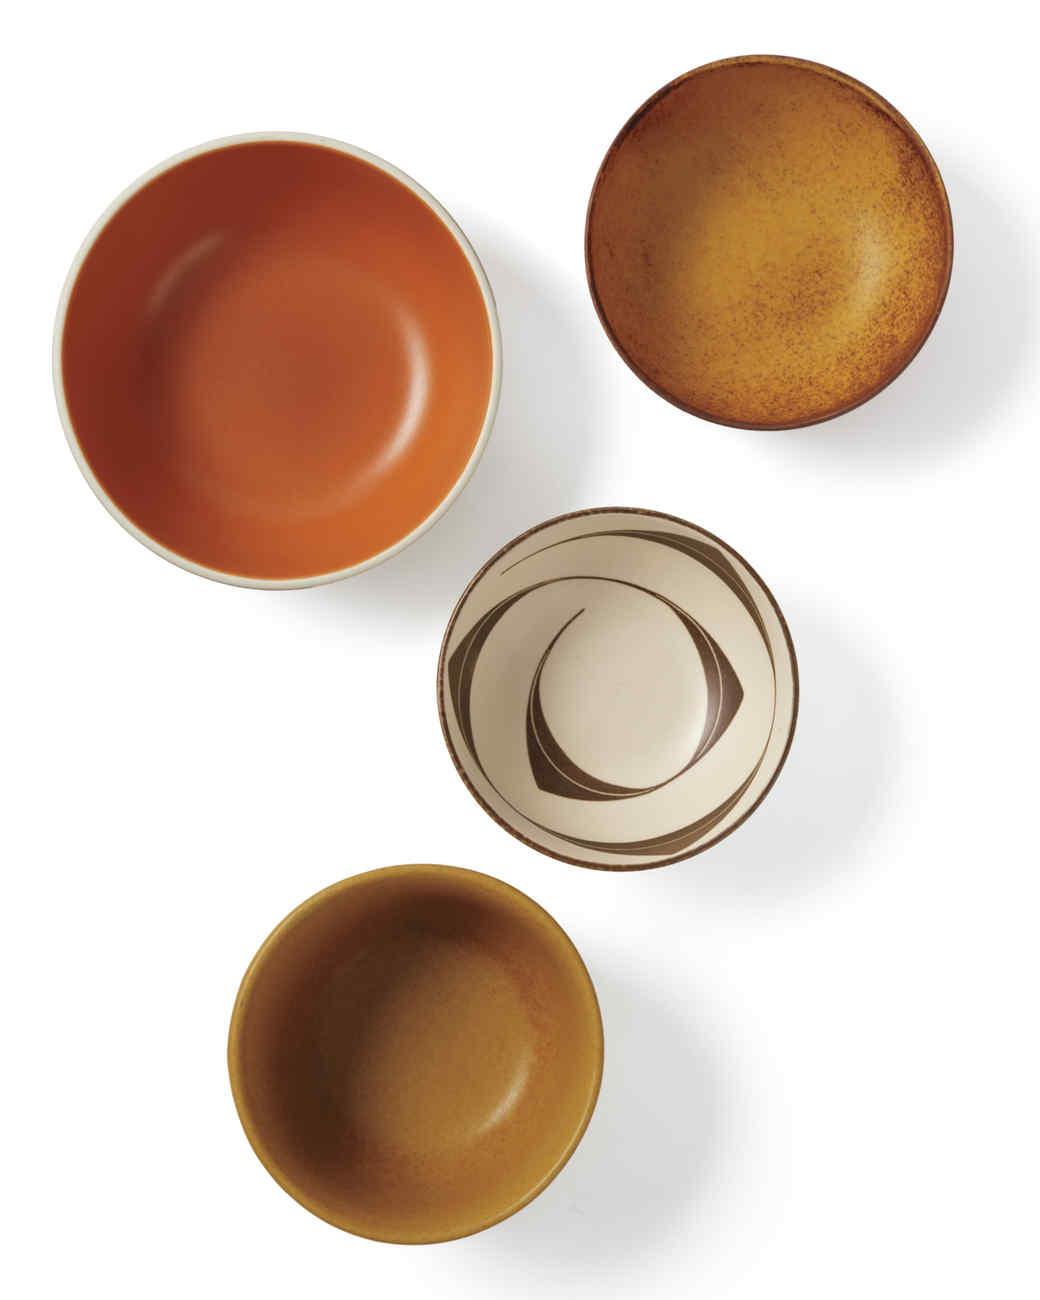 bowl-arrangement-mld109068.jpg